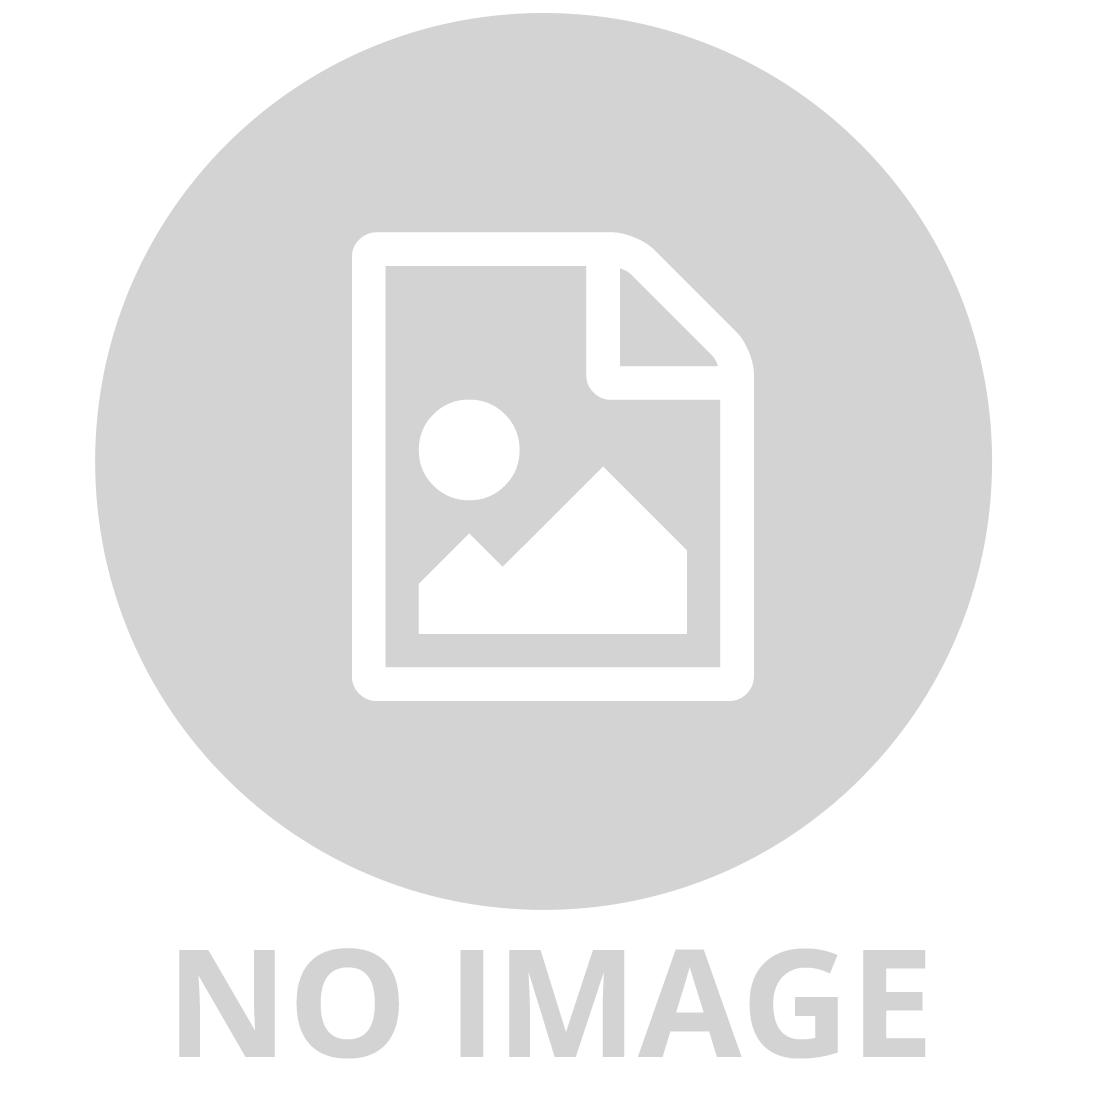 MR FOX DELUXE COSTUME SIZE MEDIUM 5-6 YEARS